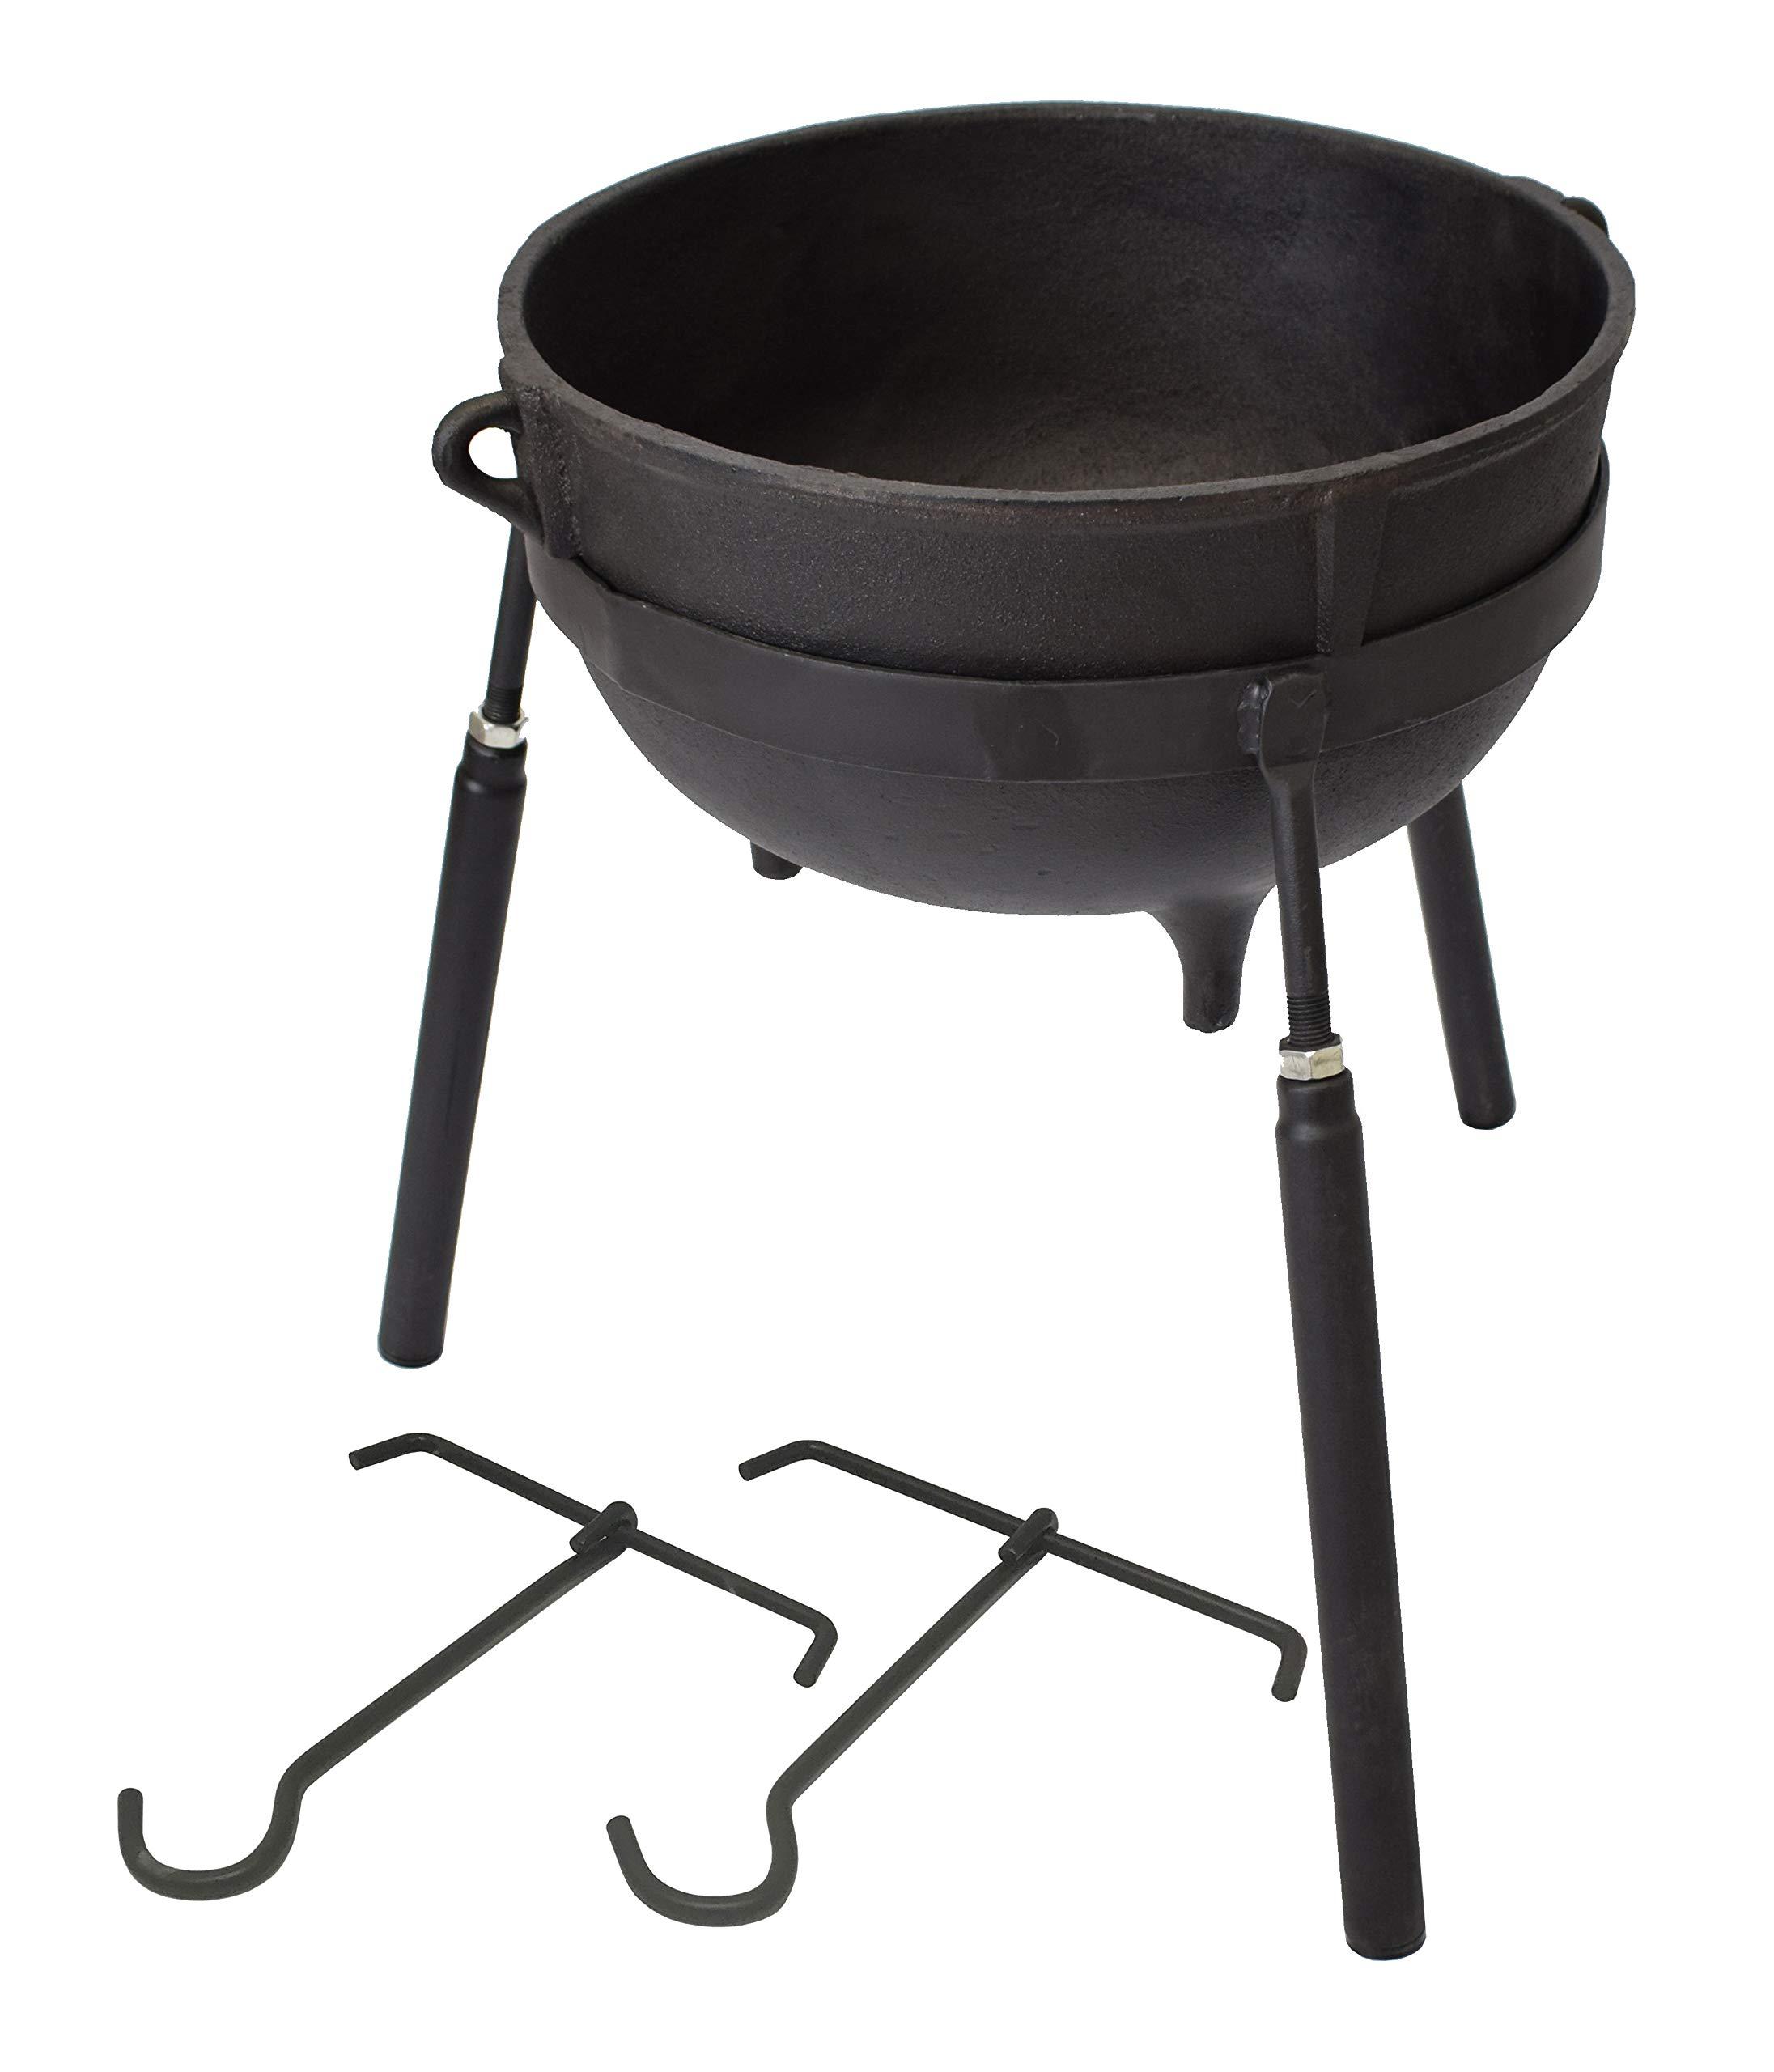 COOKAMP 7-Gallon Heavy Duty Cast Iron Jambalaya Pot, with Stand [JA07] by COOKAMP (Image #1)